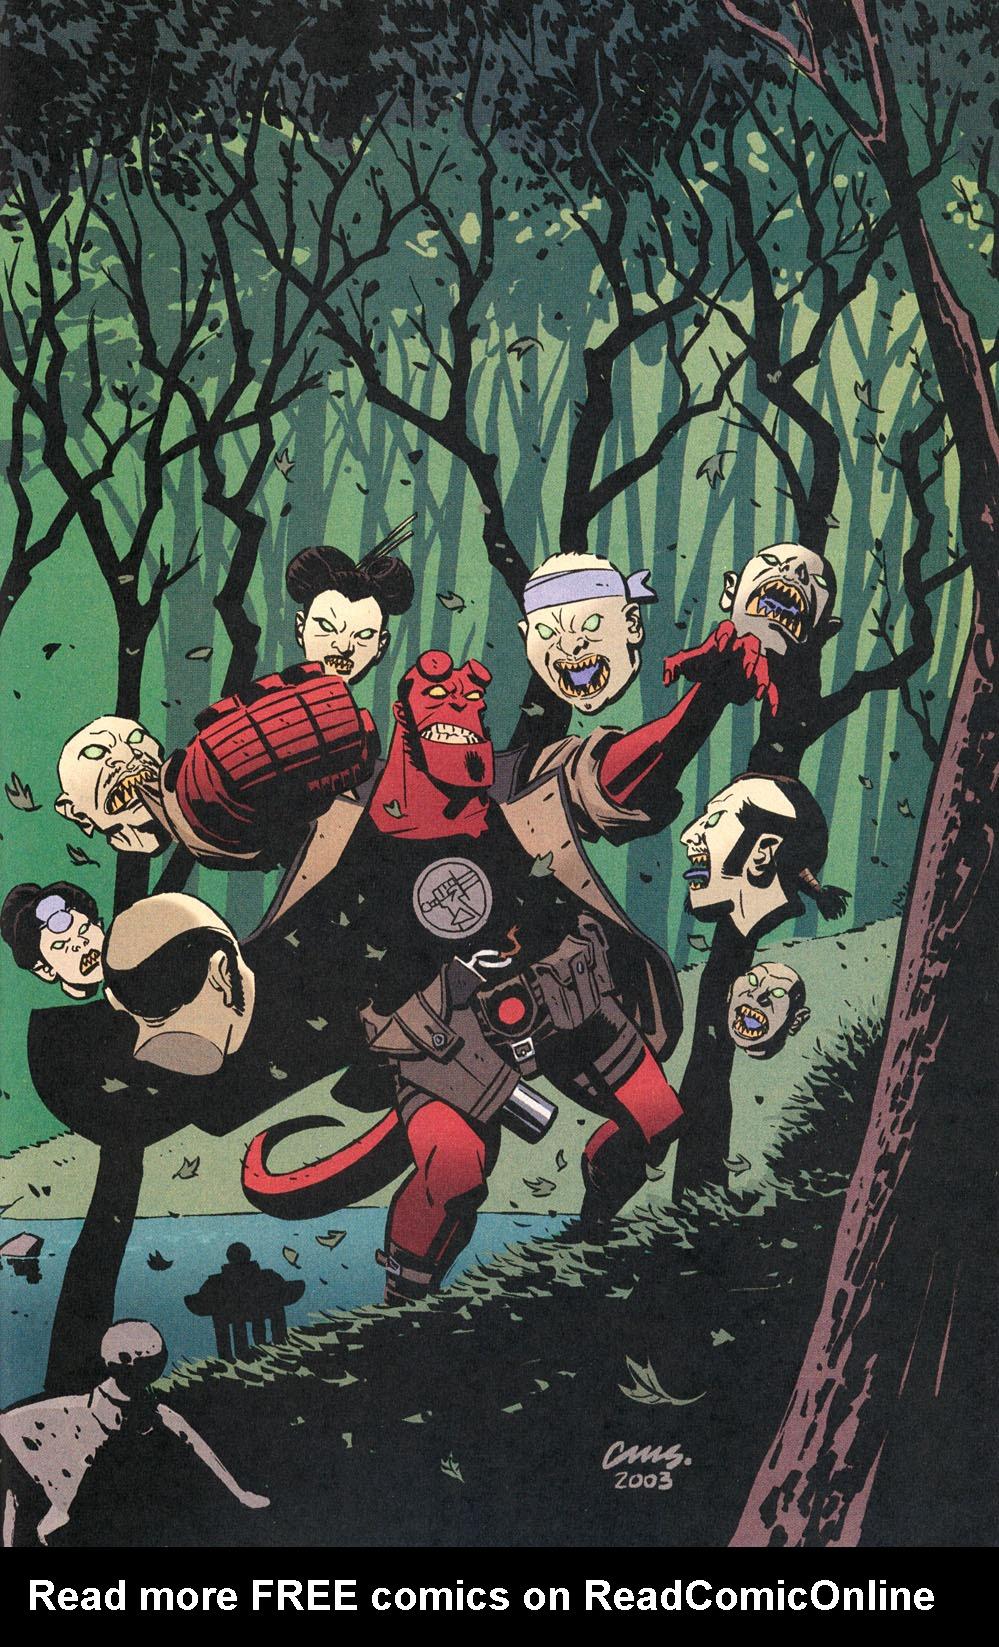 Read online Hellboy: Weird Tales comic -  Issue #5 - 27